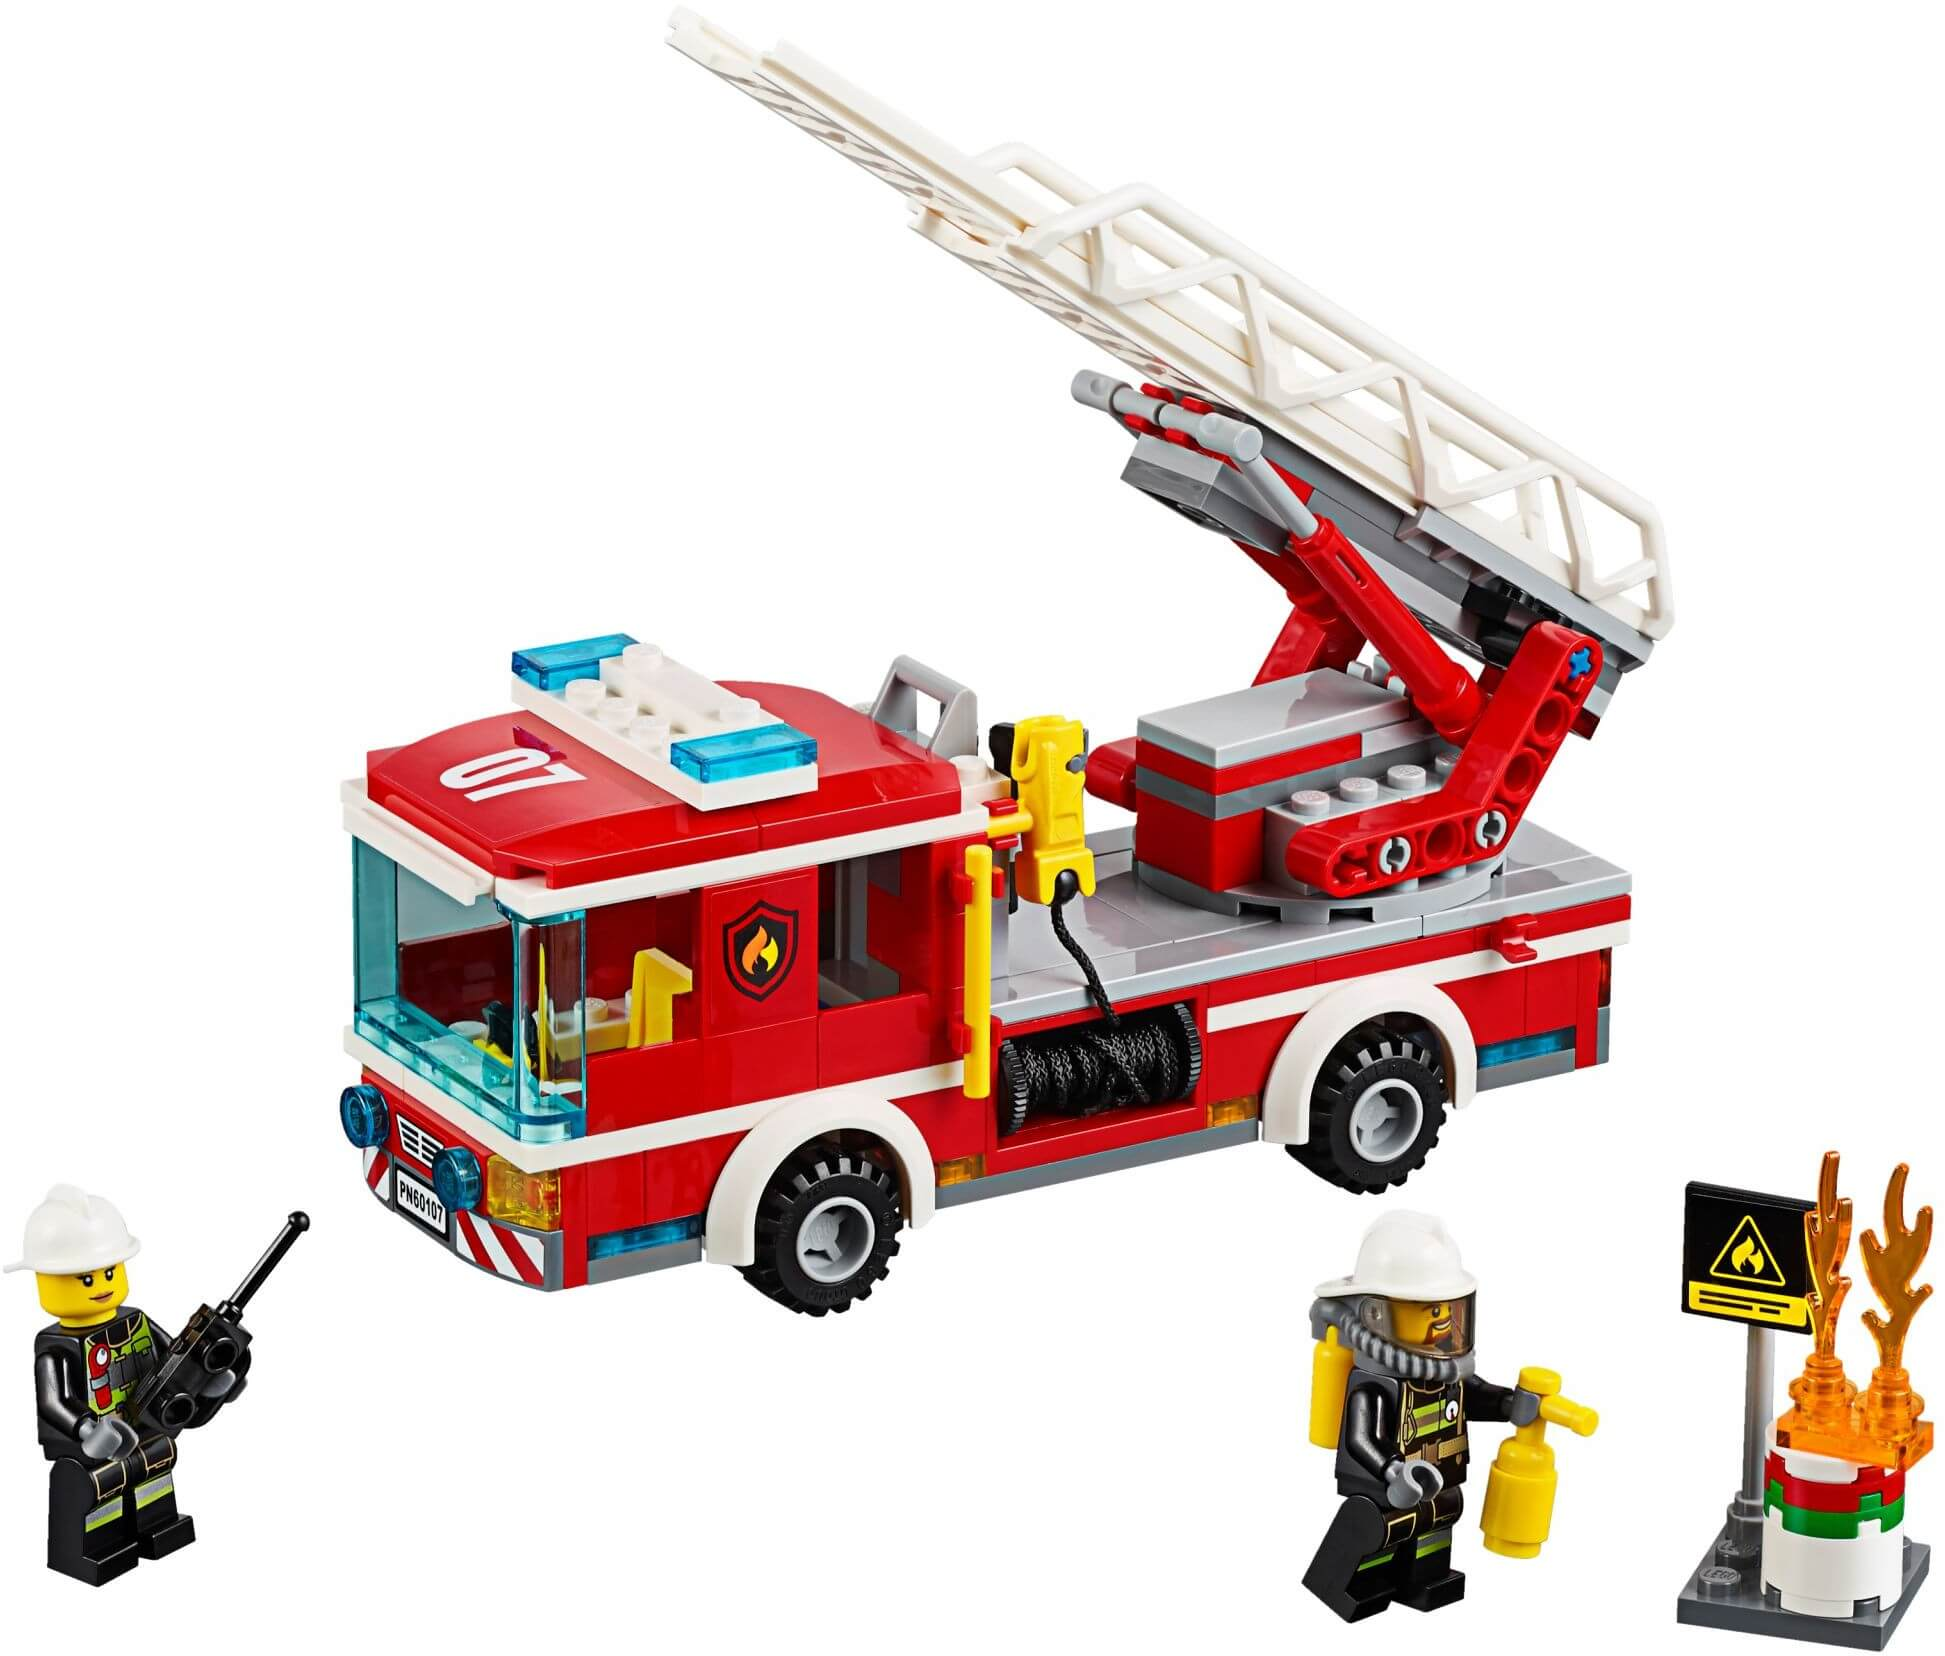 Mua đồ chơi LEGO 60107 - LEGO City 60107 - Xe Tải Cứu Hỏa (LEGO City Fire Ladder Truck 60107)